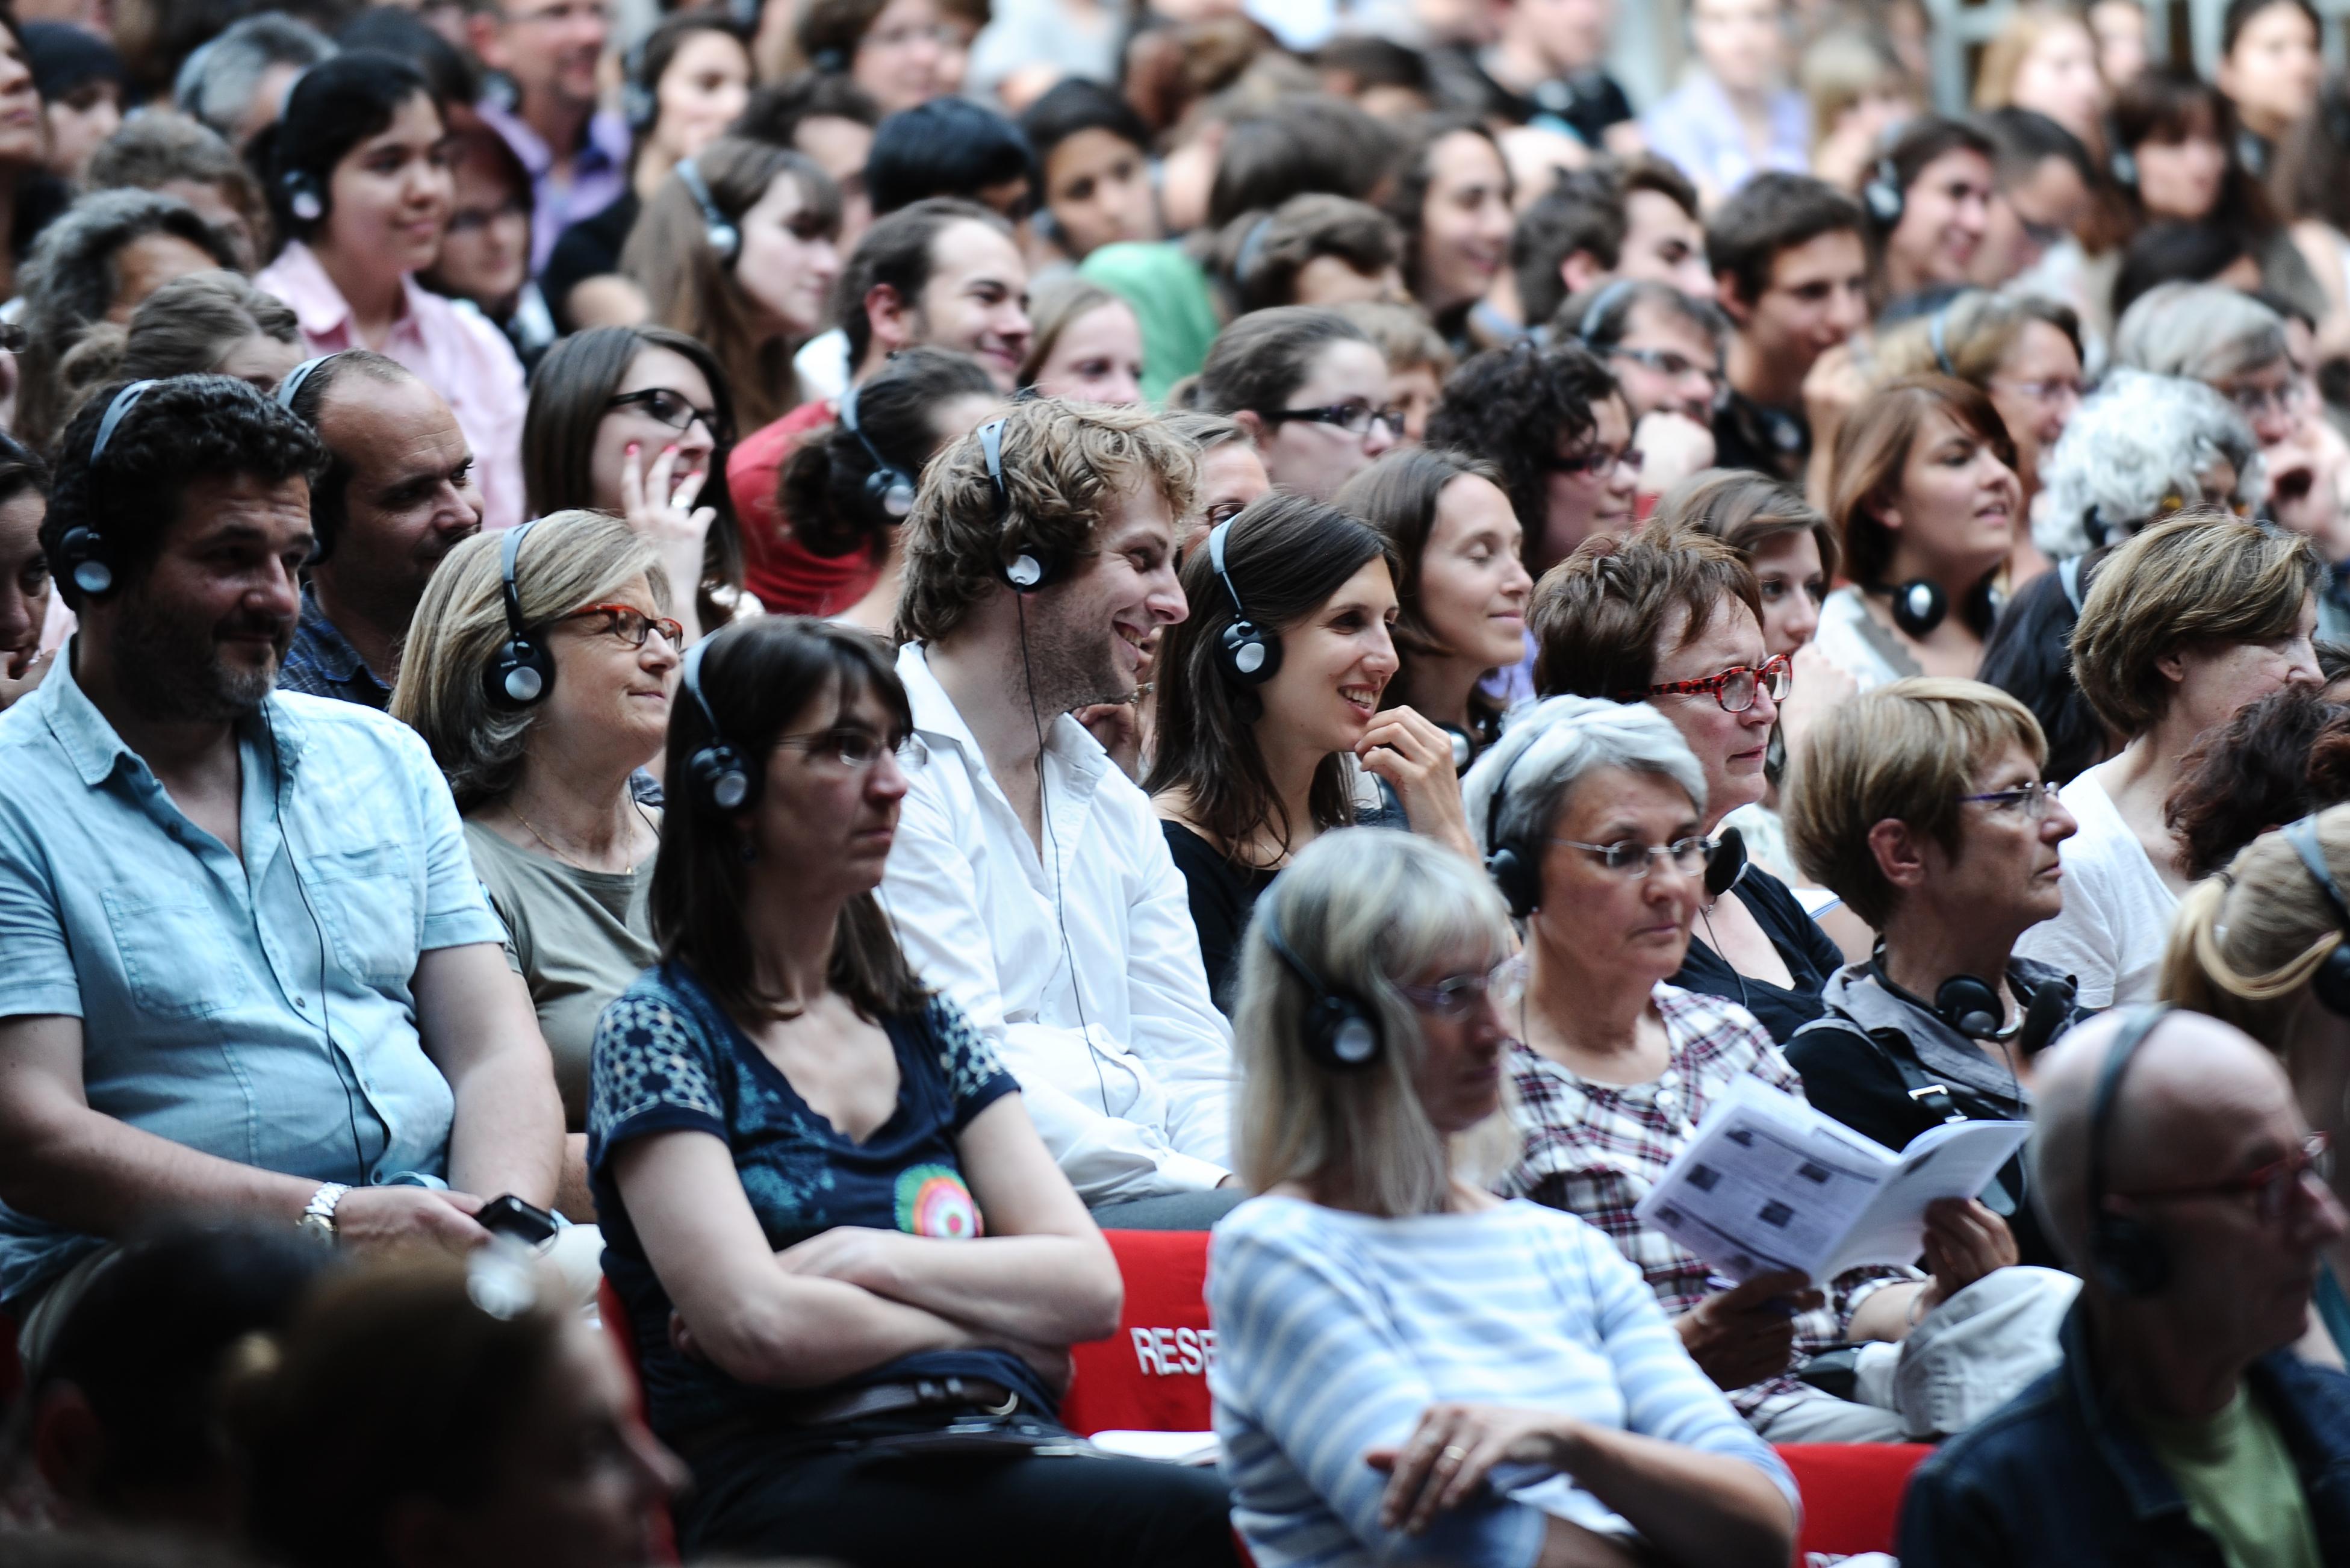 public des AIR © david ignaszewski-koboy